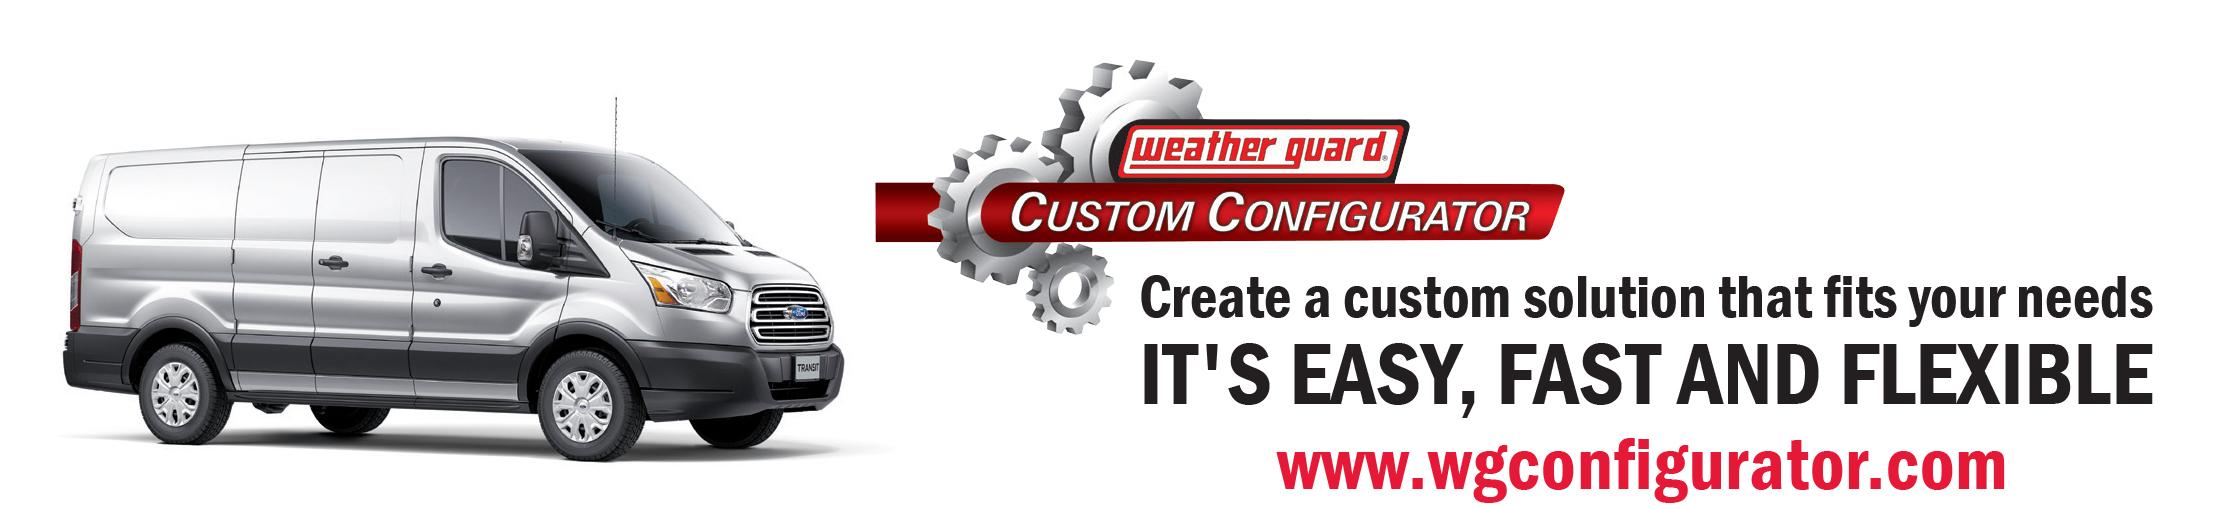 custom-configurator.jpg